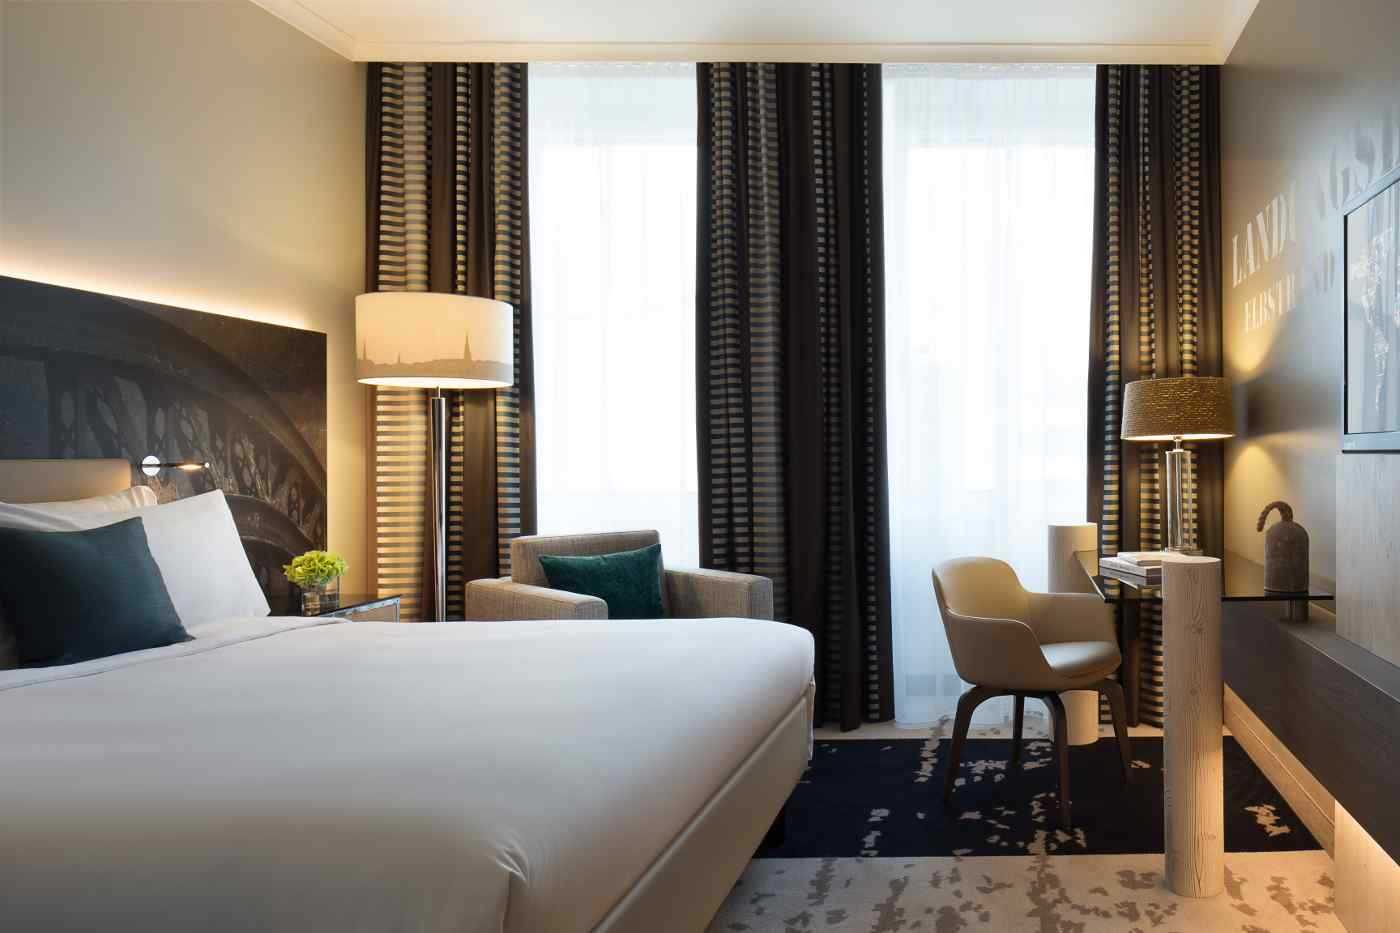 Doppelzimmer Hotel Renaissance Hamburg